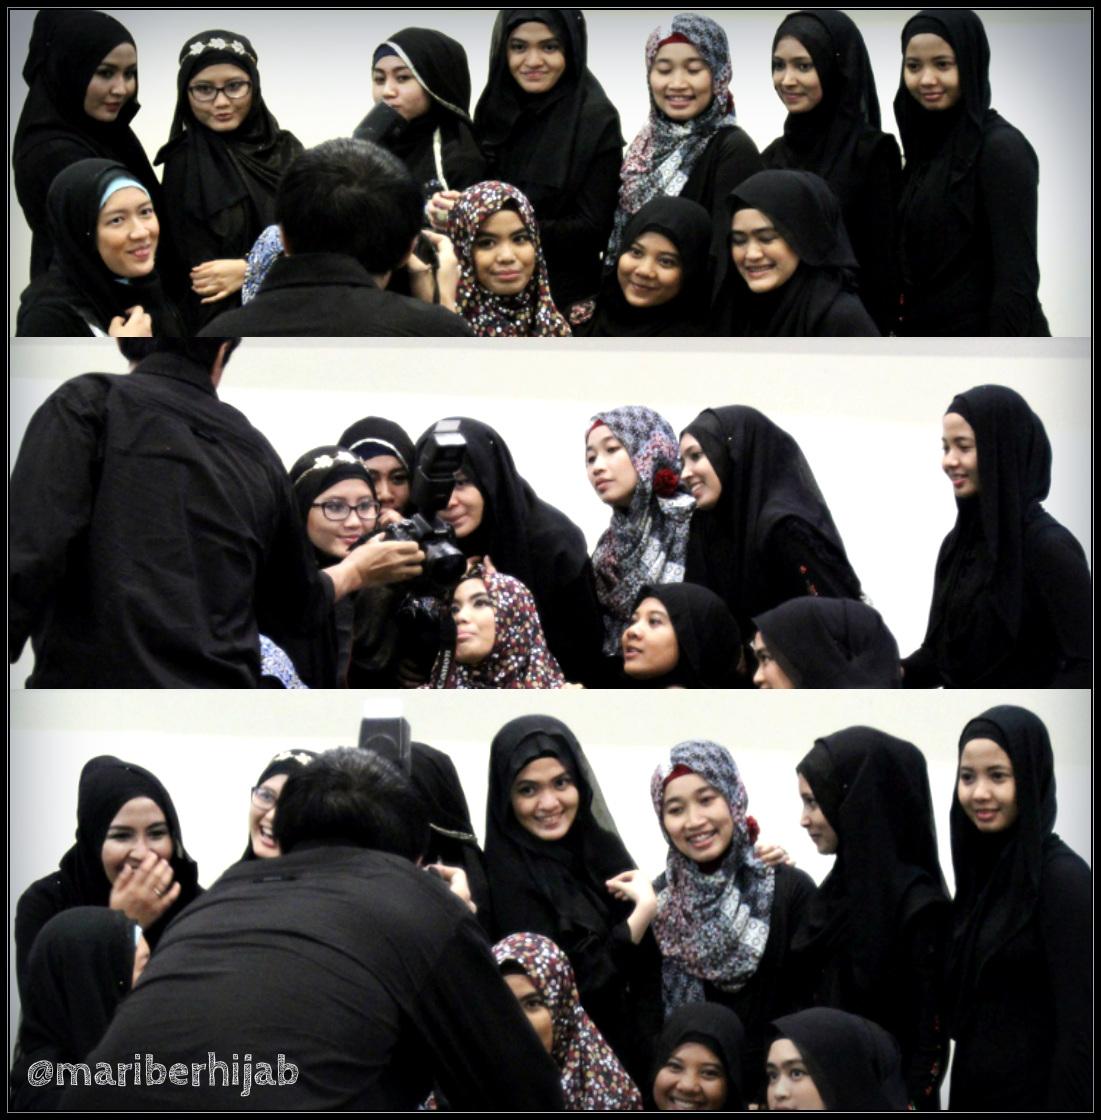 committee_1_pixlr Terharu Biru untuk Mari Berhijab